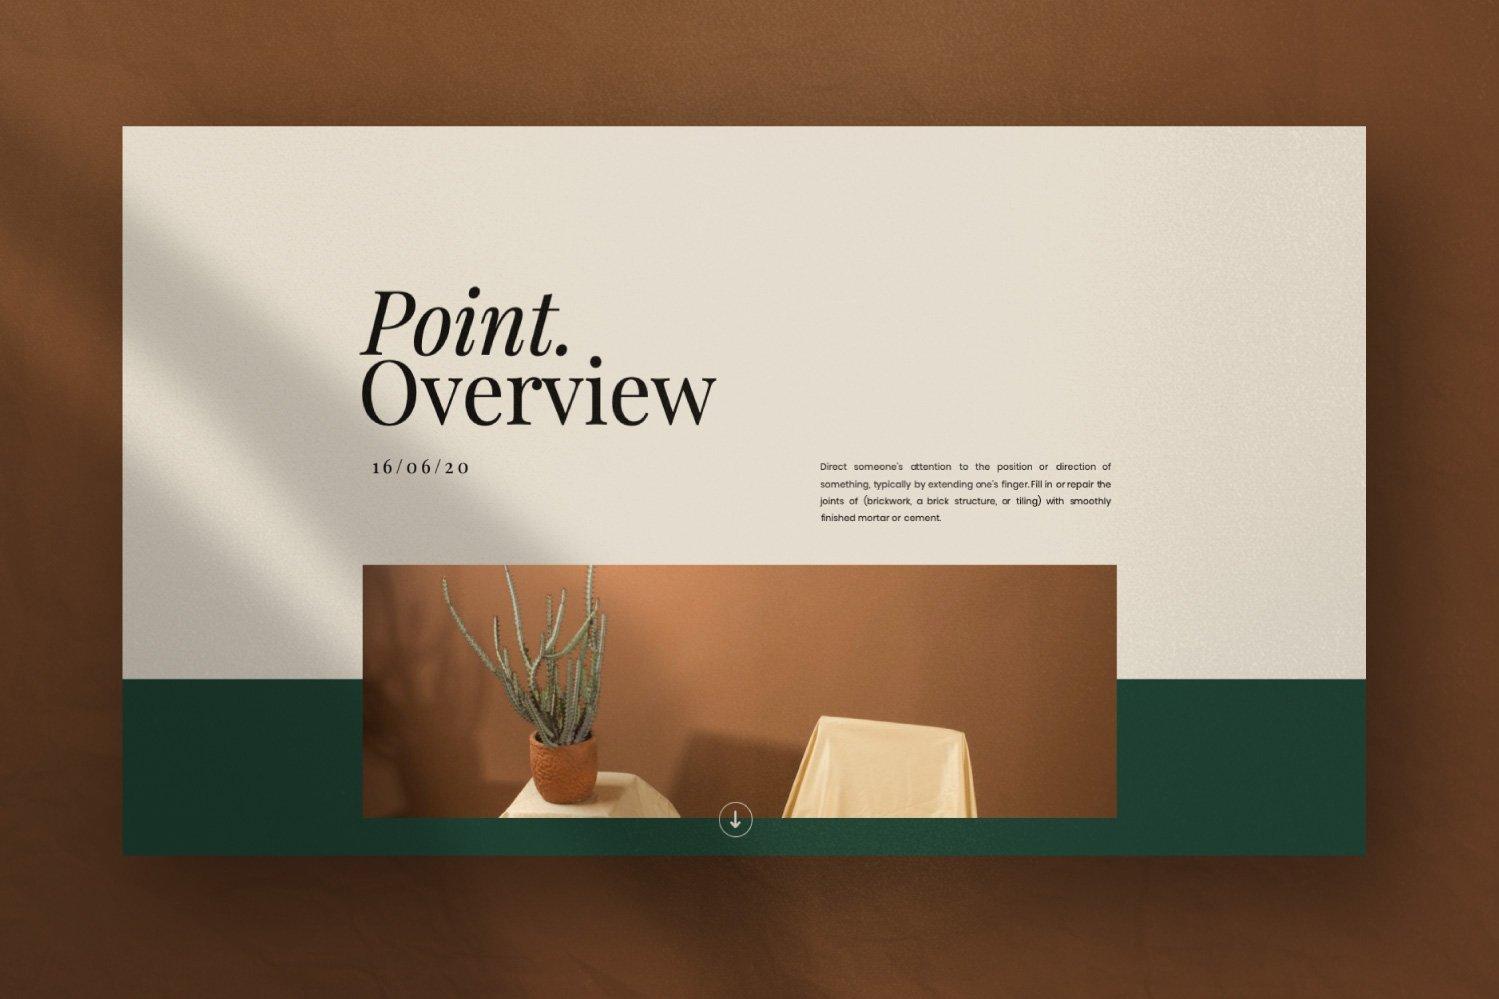 时尚创意服装摄影作品集幻灯片设计模板 Iconic – Fashion Lookbook PowerPoint插图(8)